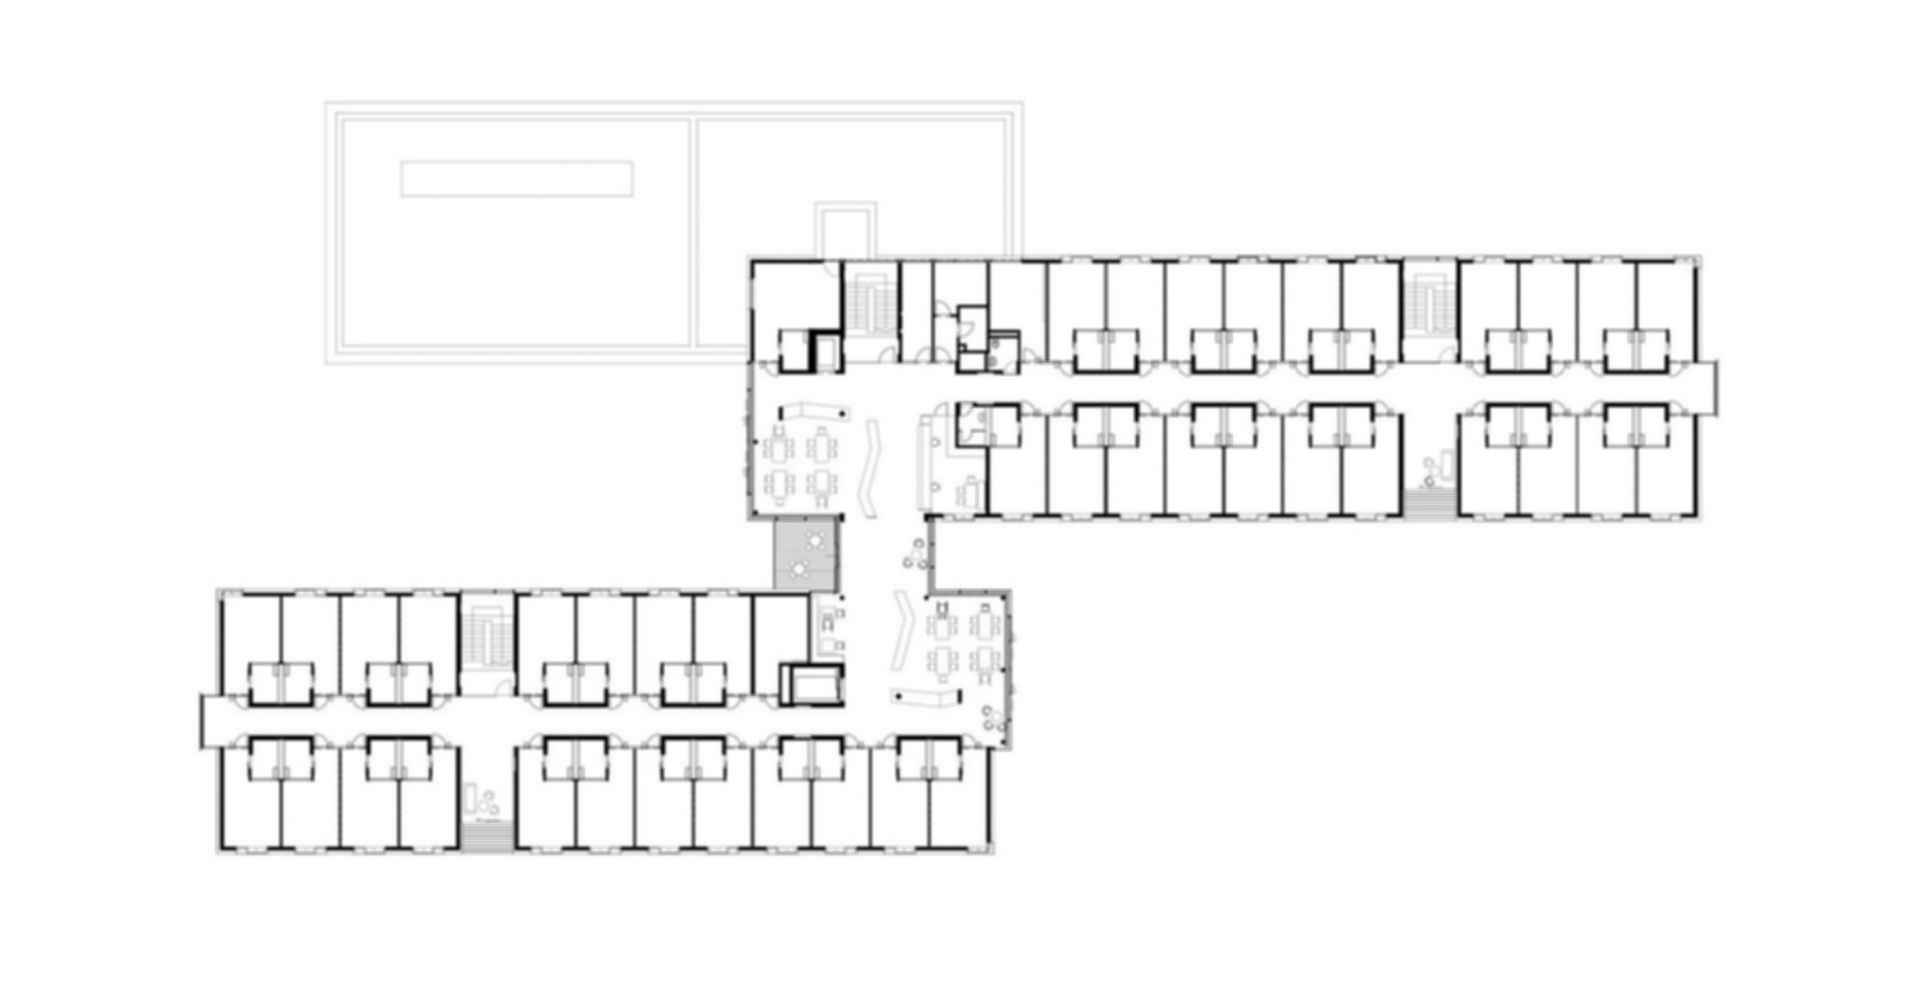 Nursing Home in Esternberg - floor plan